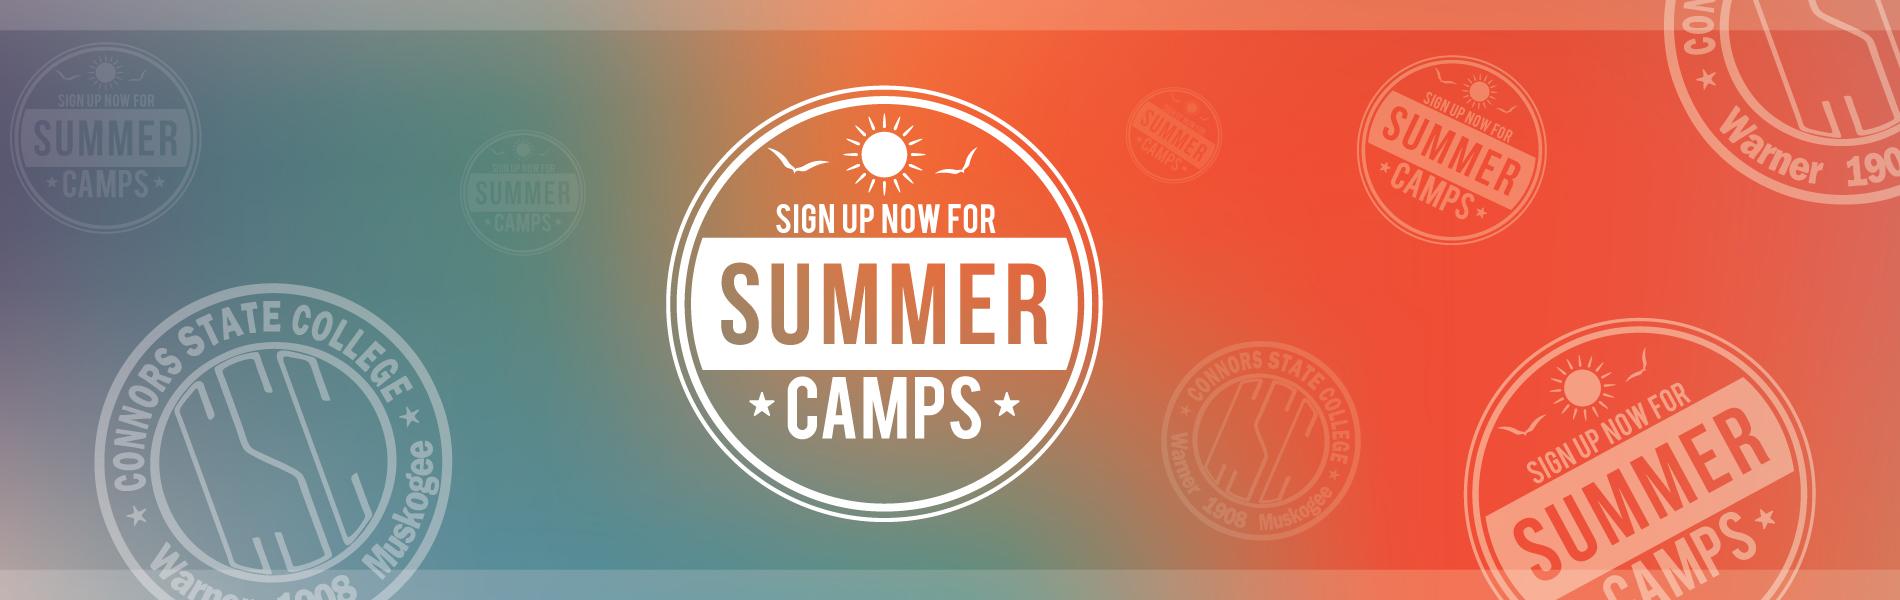 web_summercamp2.1